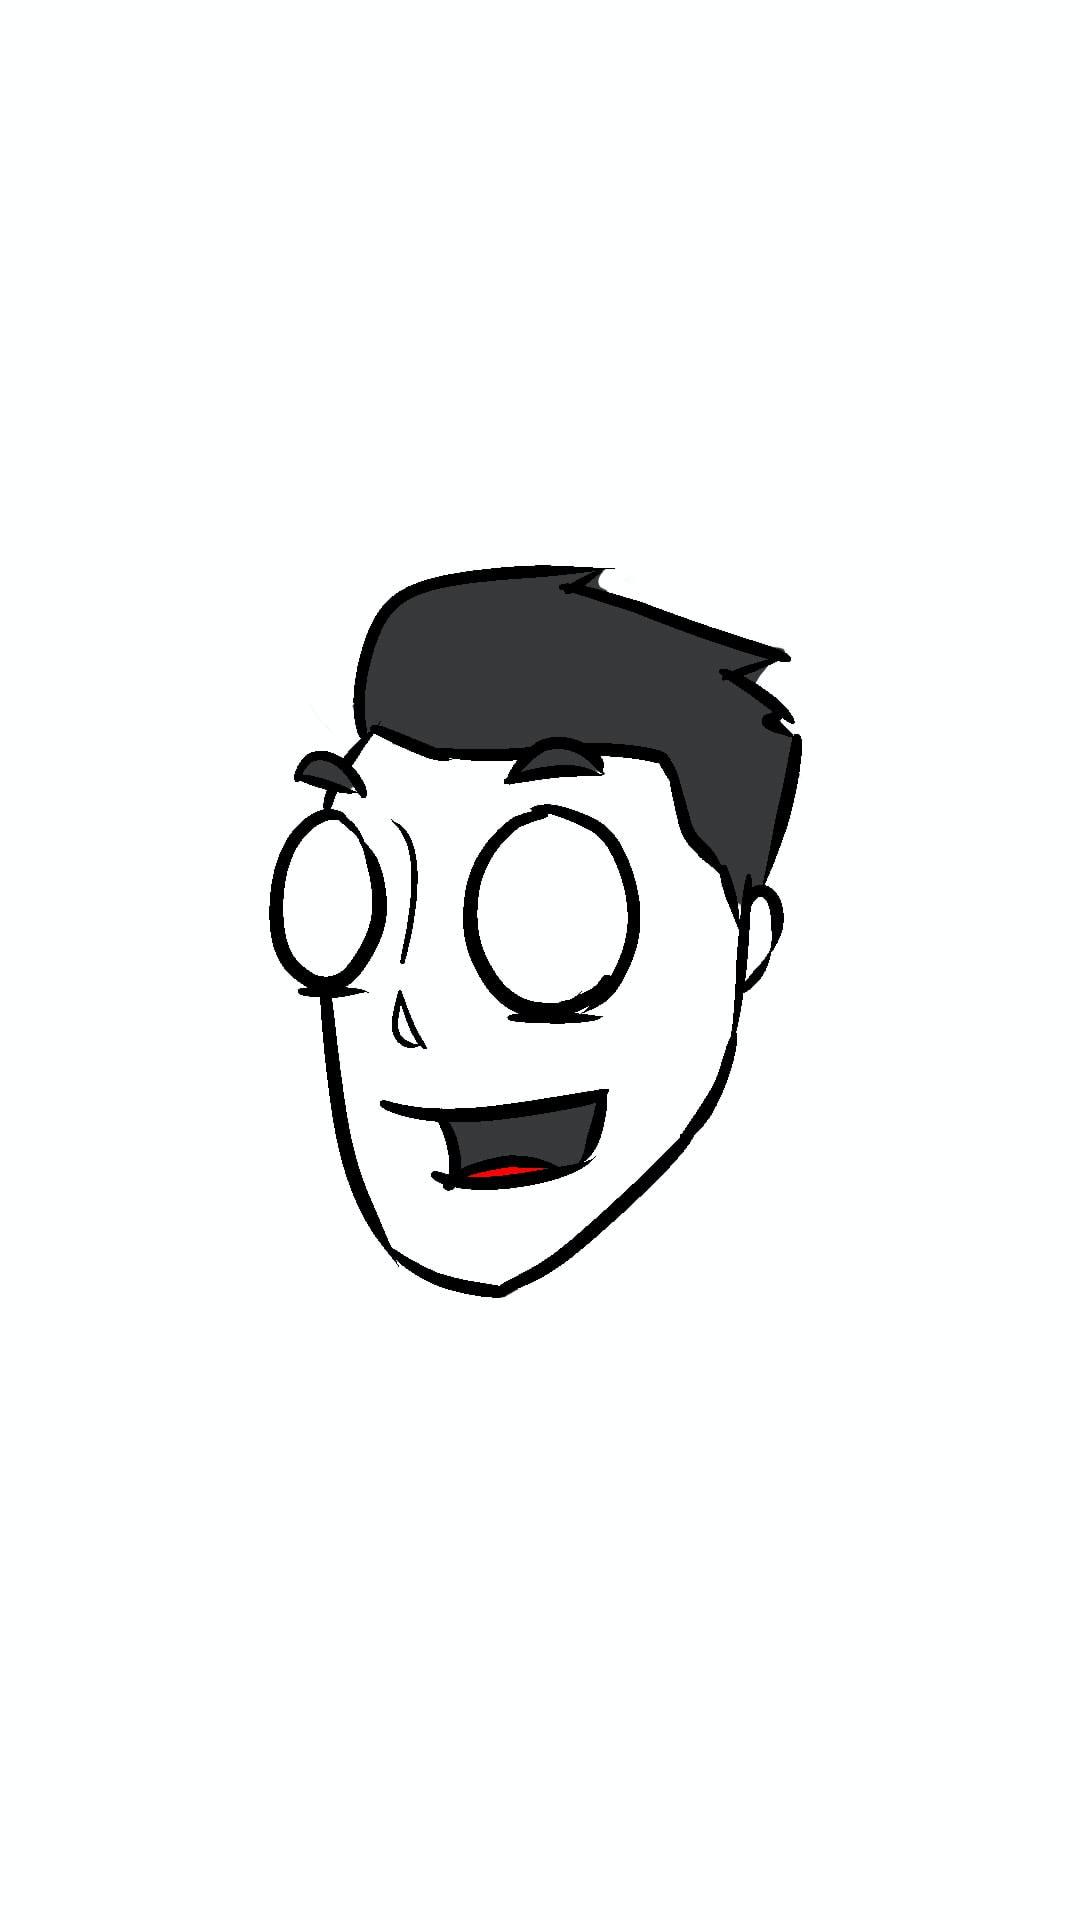 Go to Brandon ong's profile